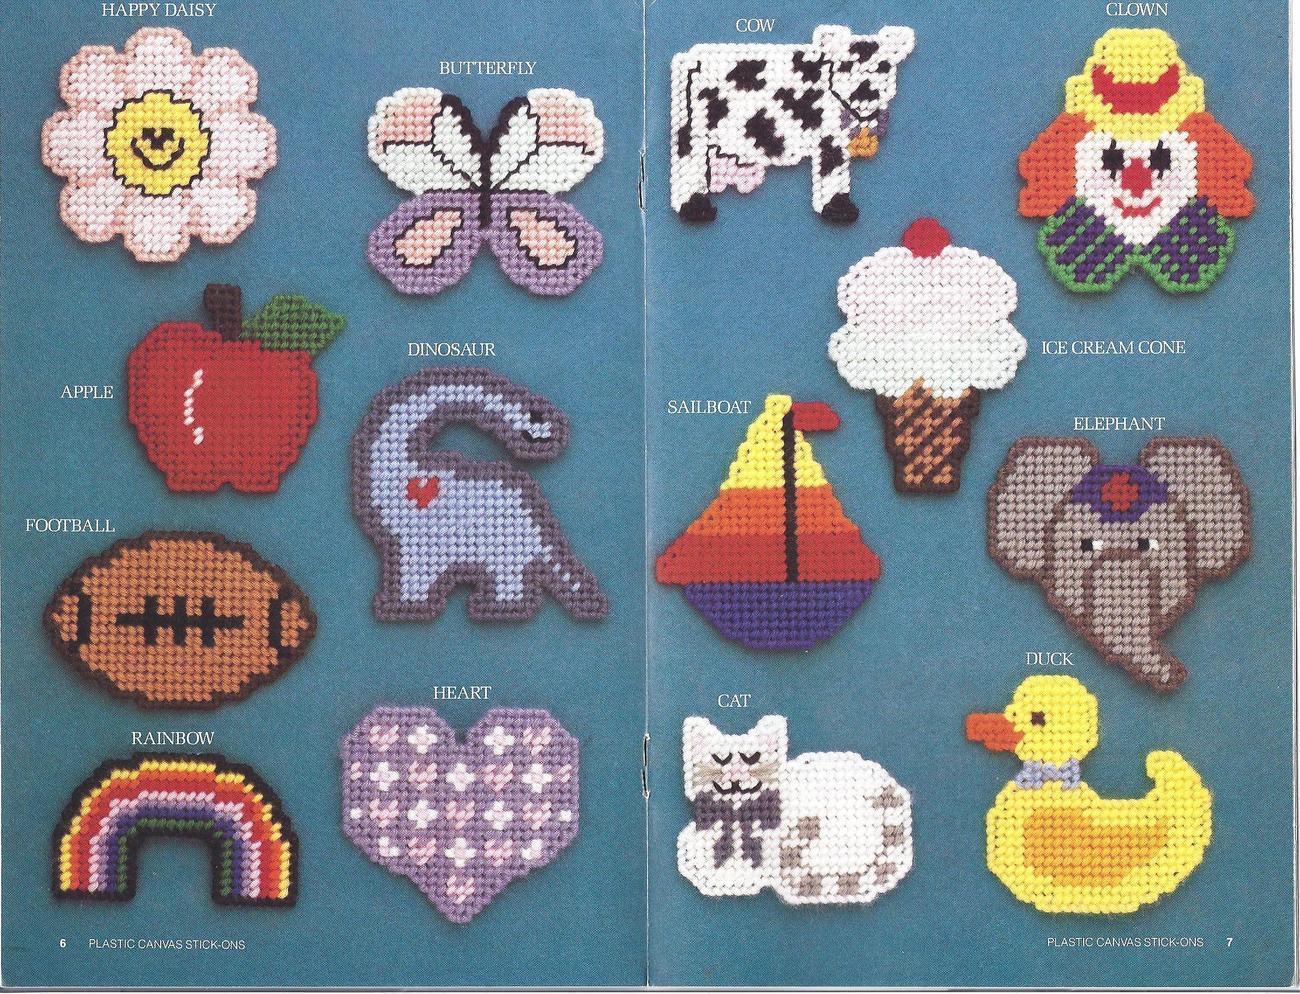 Plastic Canvas Stick-Ons 14 Designs Annie's Attic